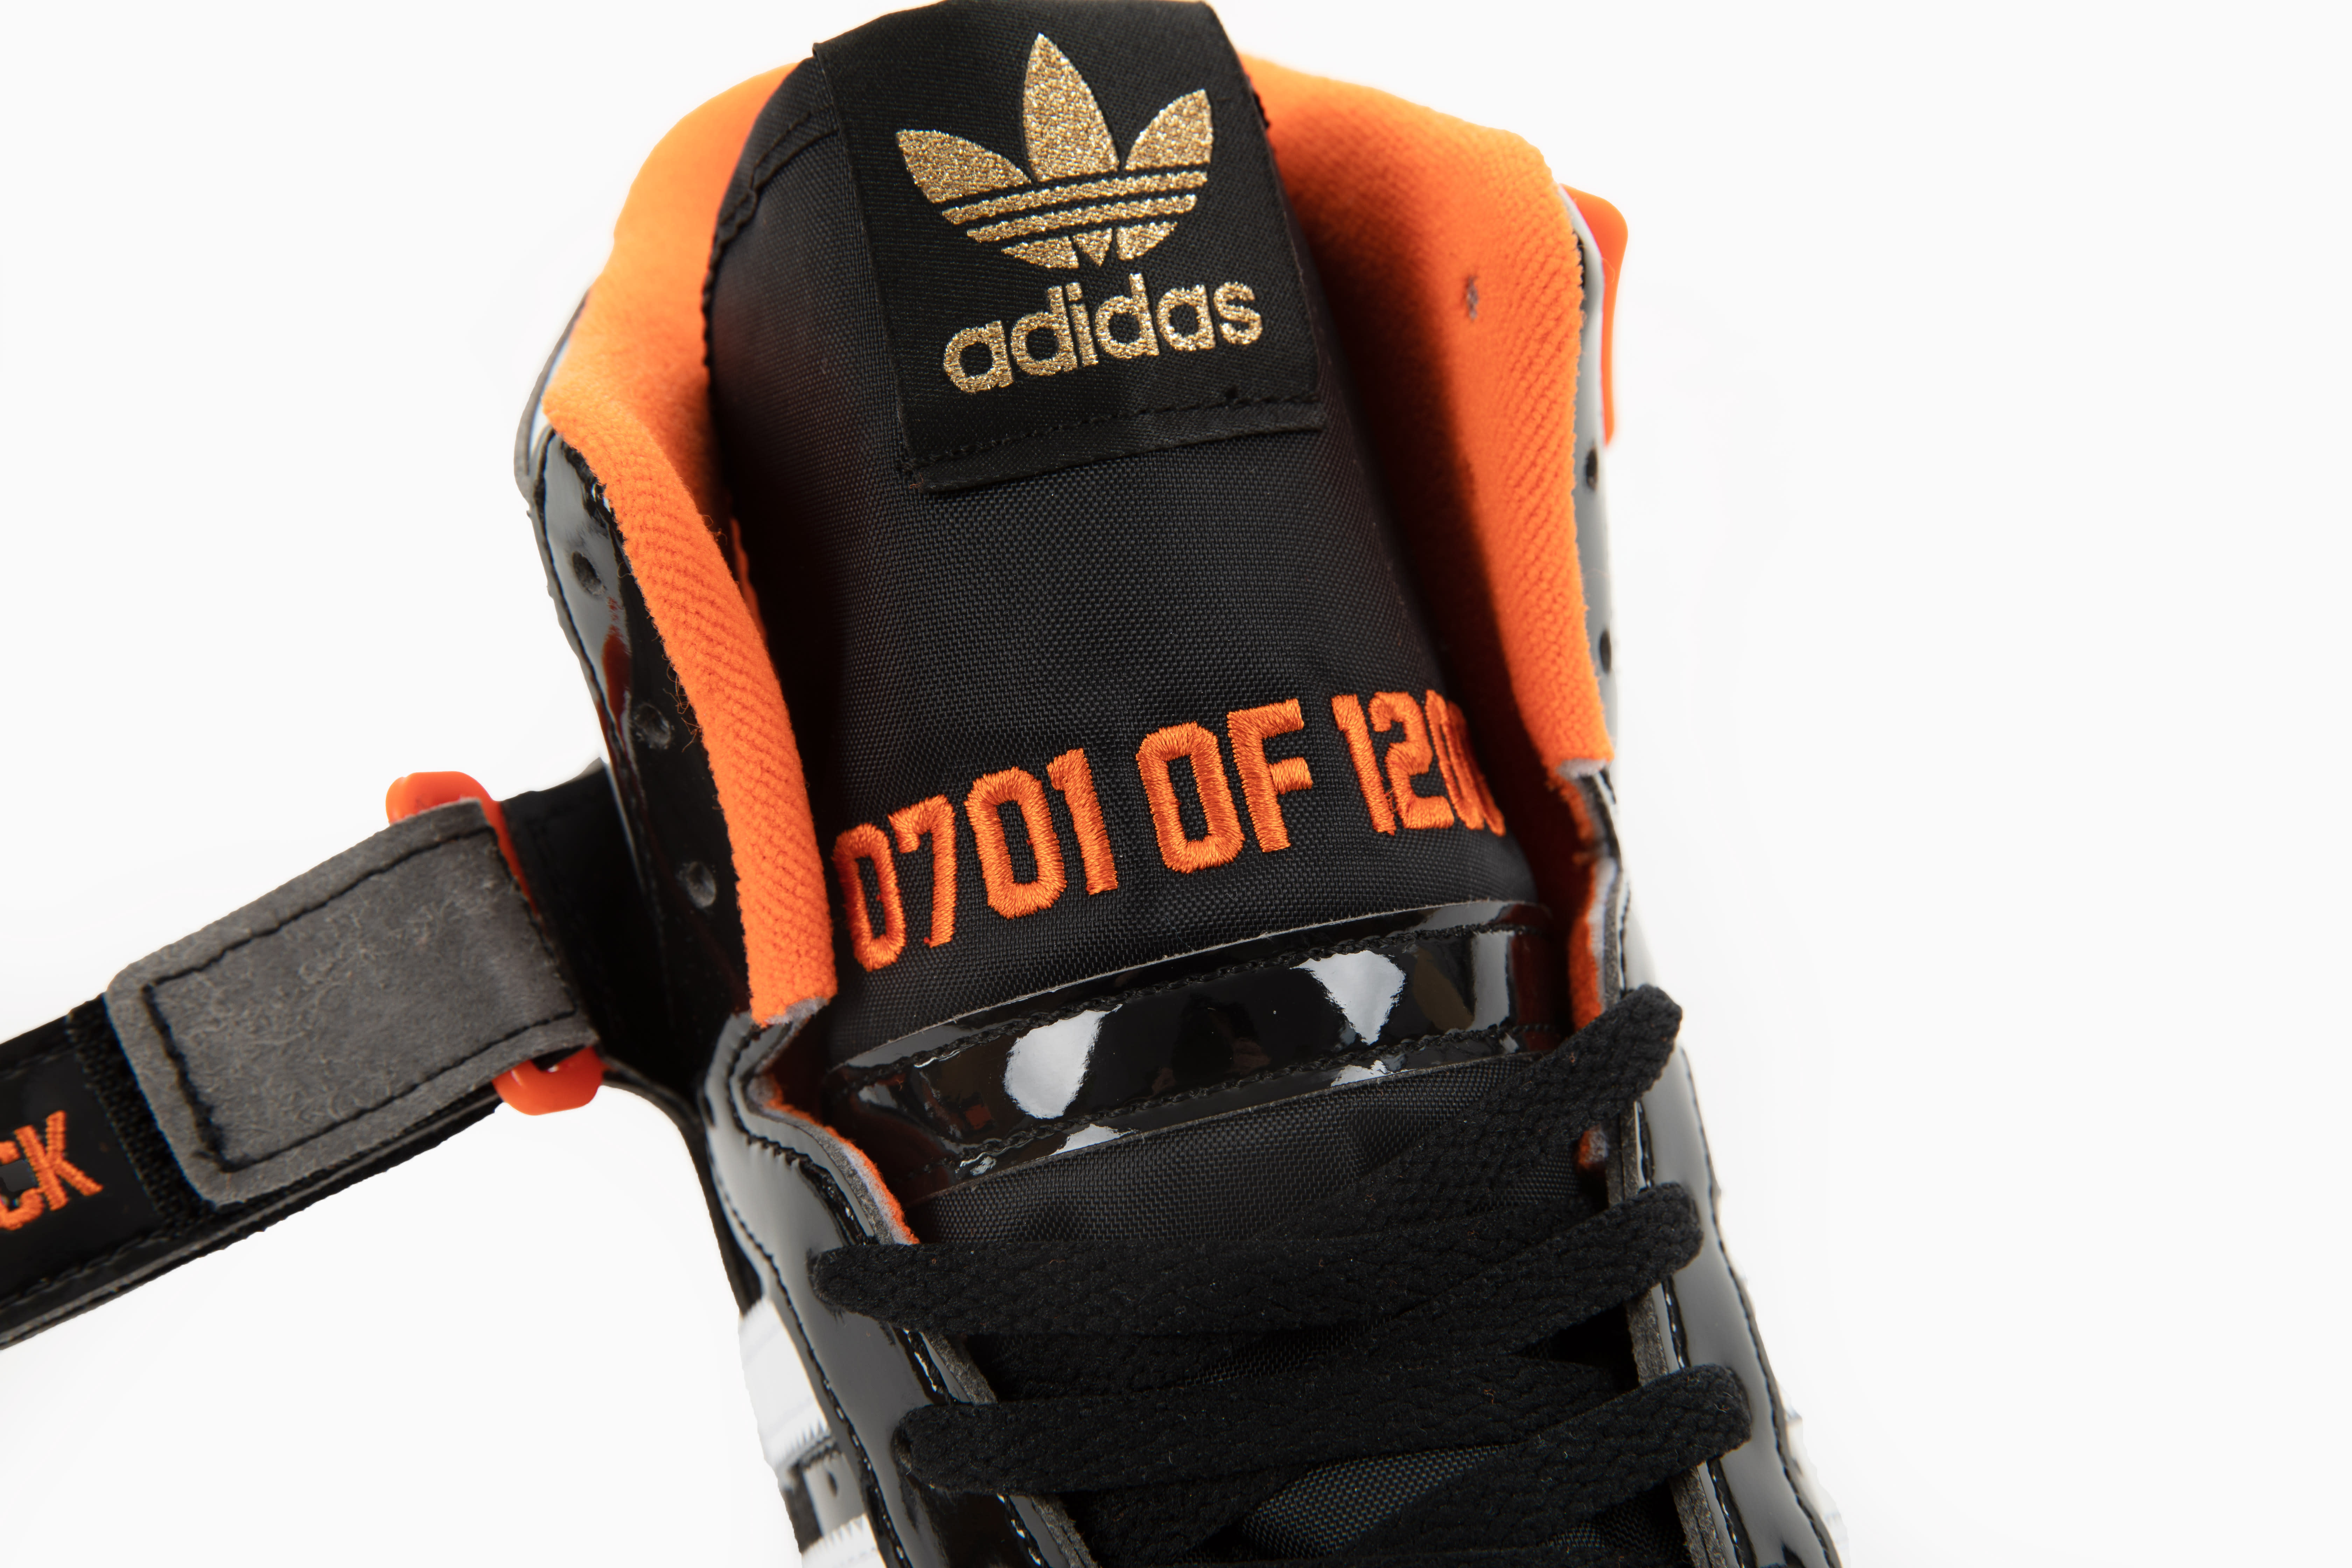 Snipes x Adidas Forum 'Detroit Bad Boys' GZ8375 Tongue